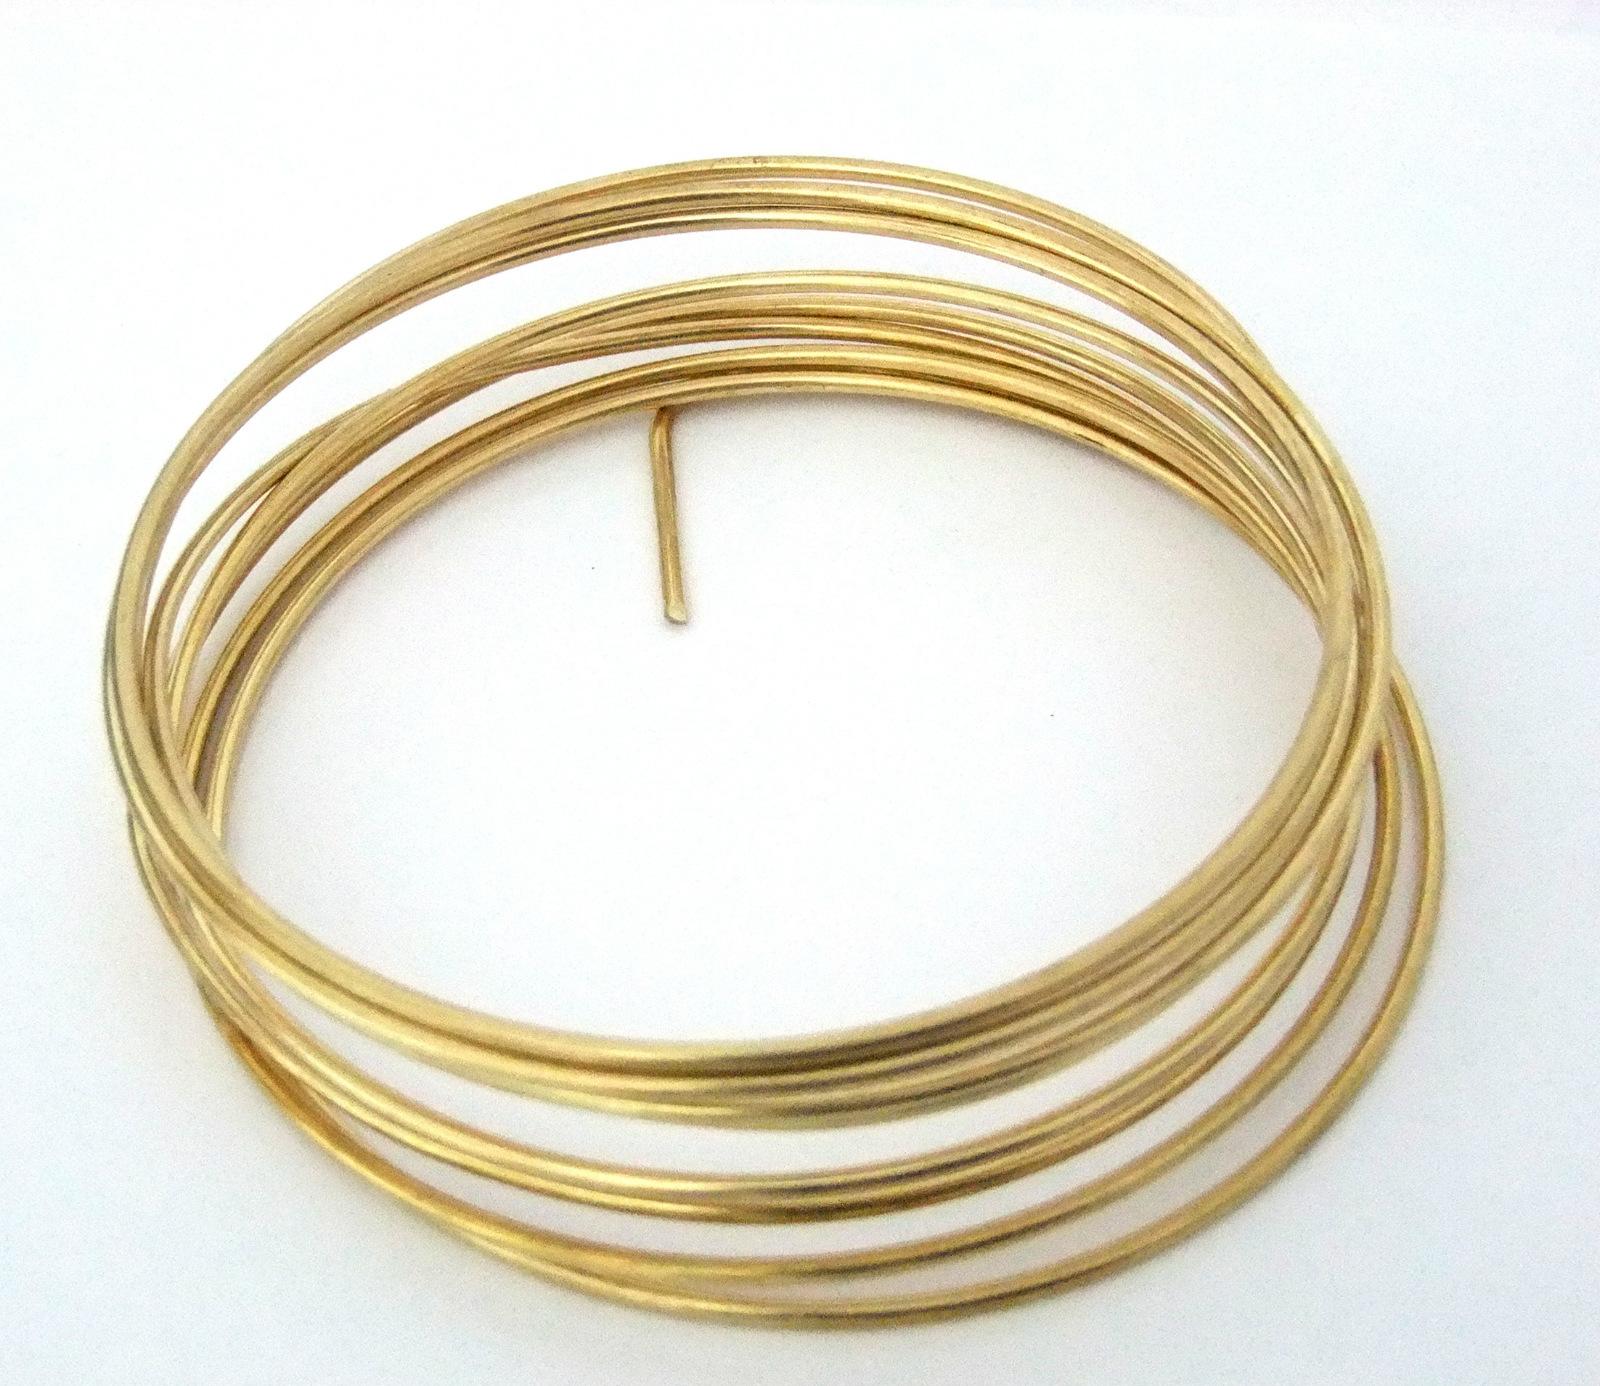 10 Ga Wire - Dolgular.com